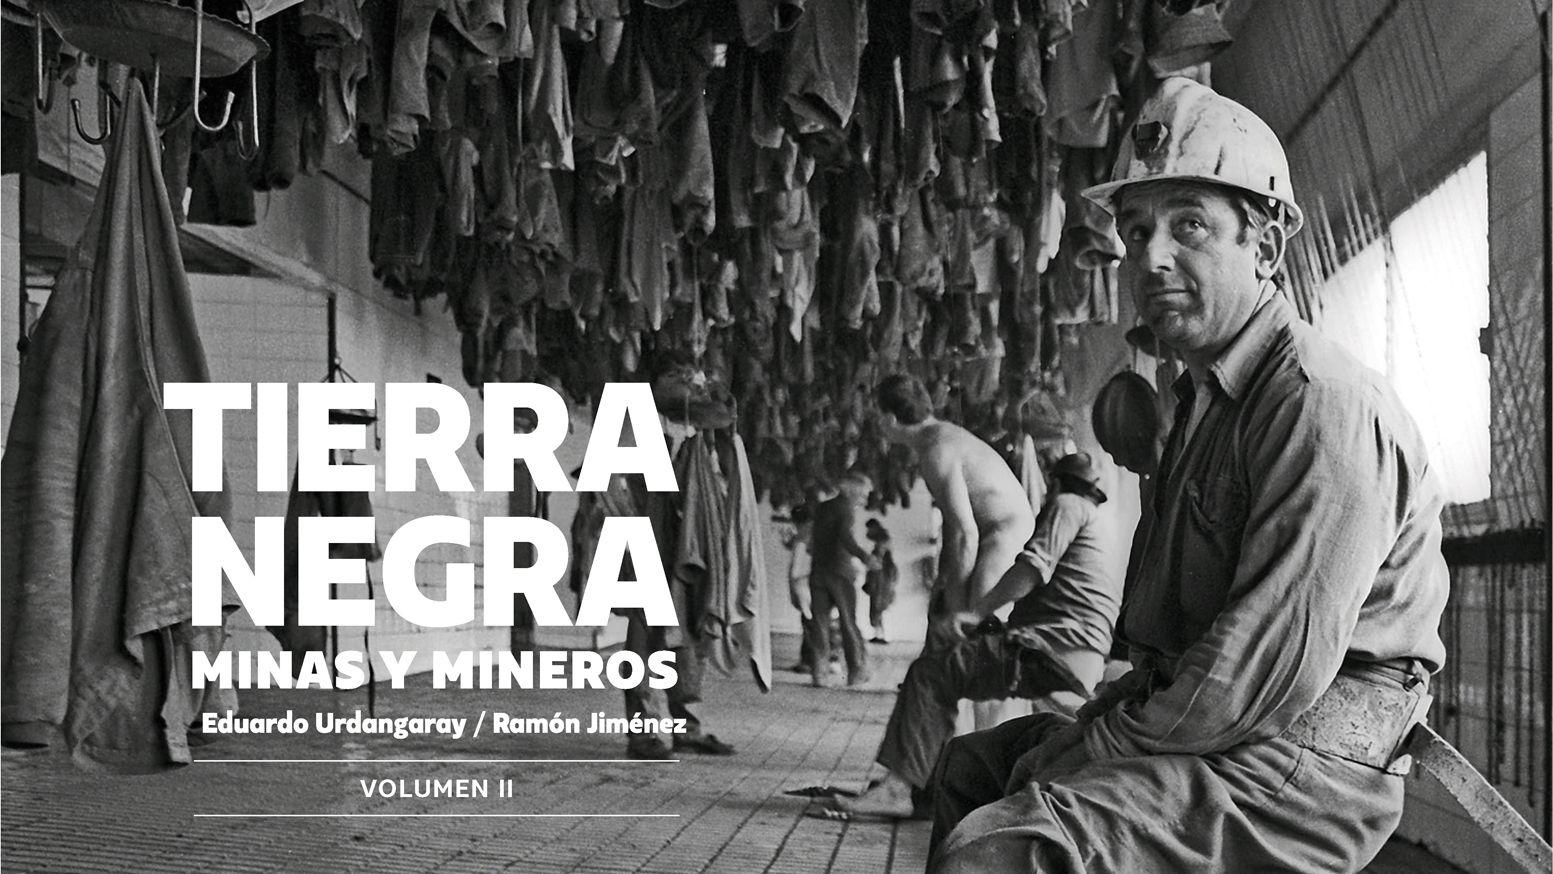 Libro «Tierra Negra Vol.II» de Eduardo Urdangaray y Ramón Jiménez